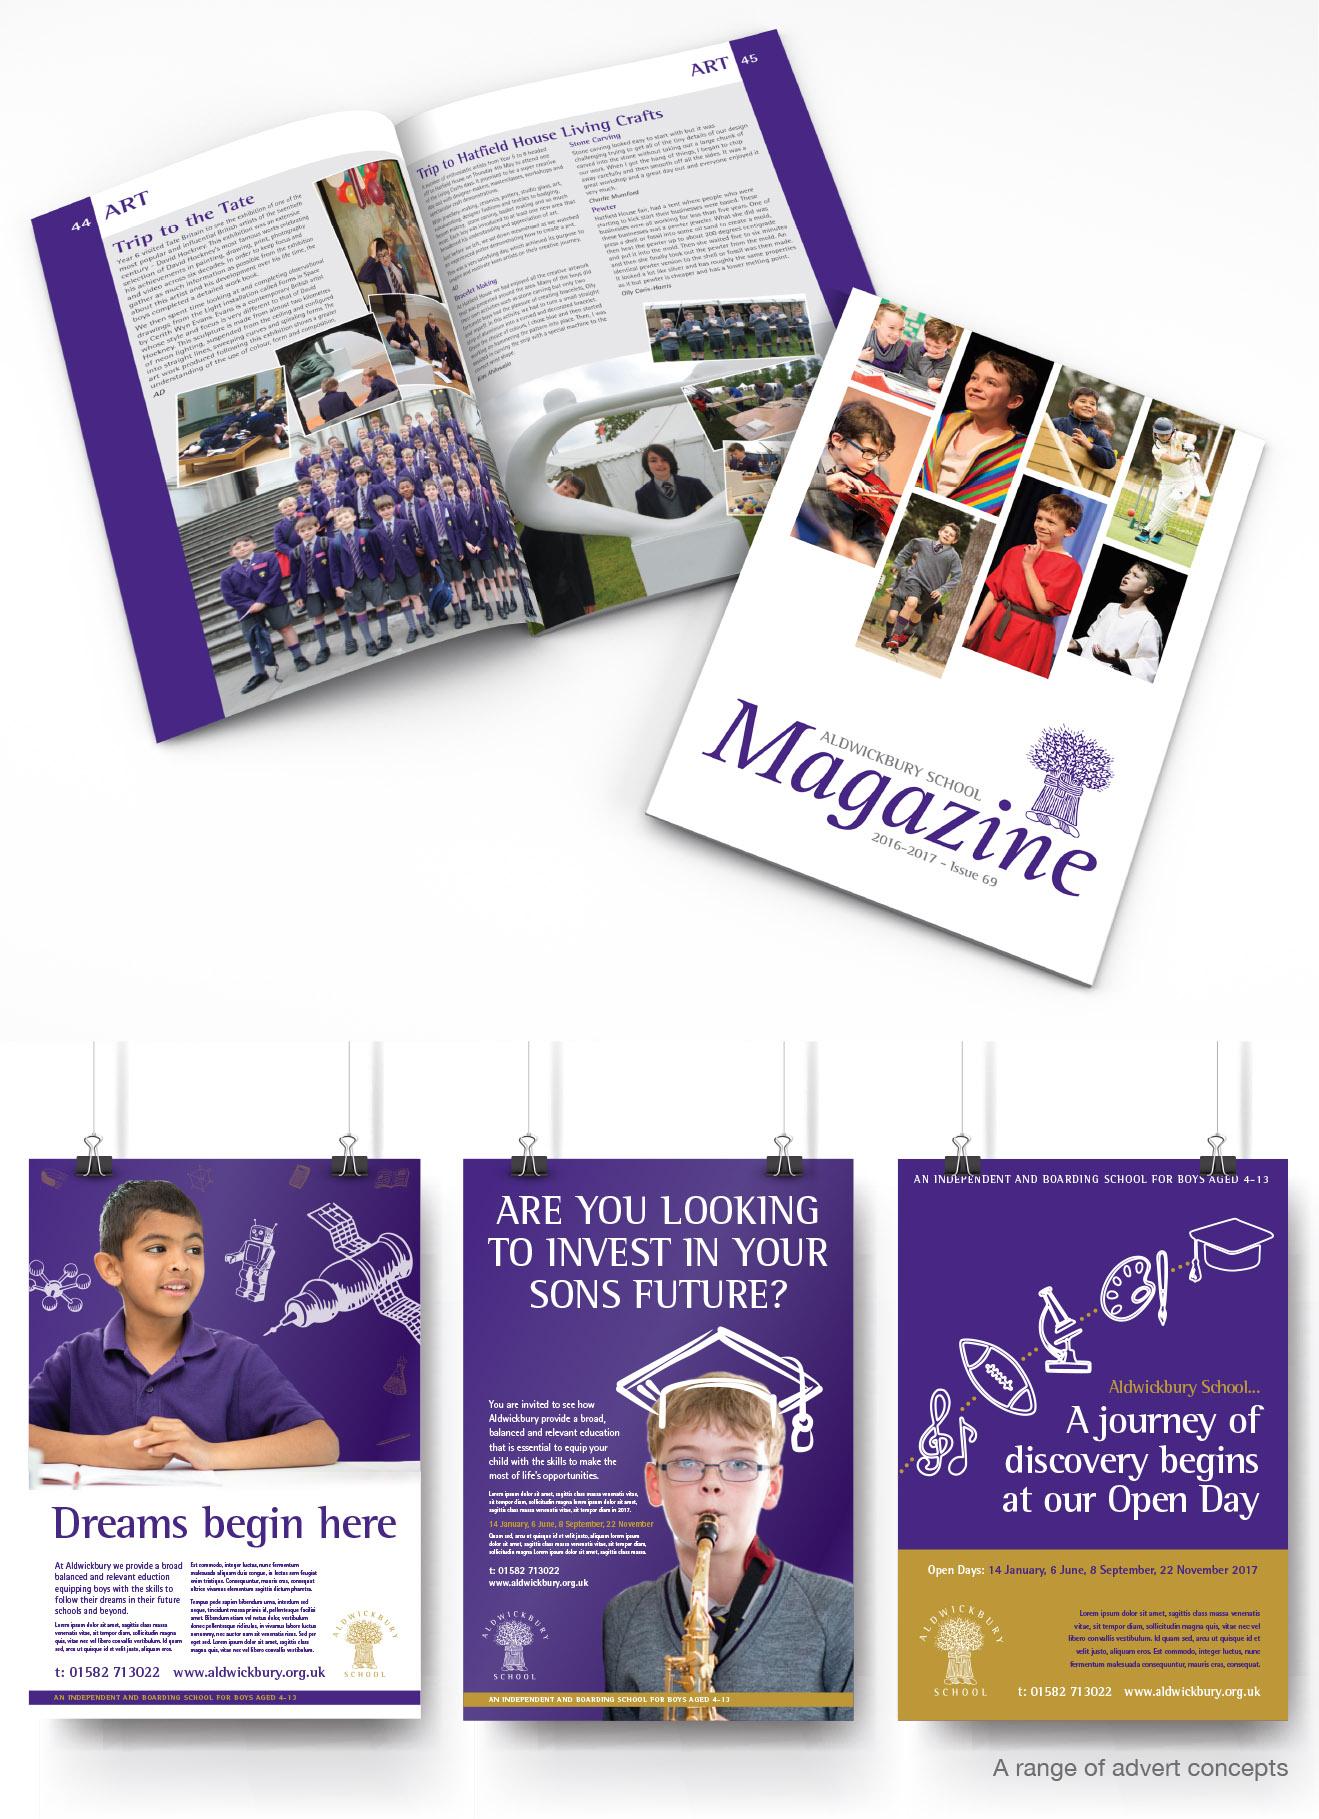 Image showing Alwdwickbury School magazine and advert concepts